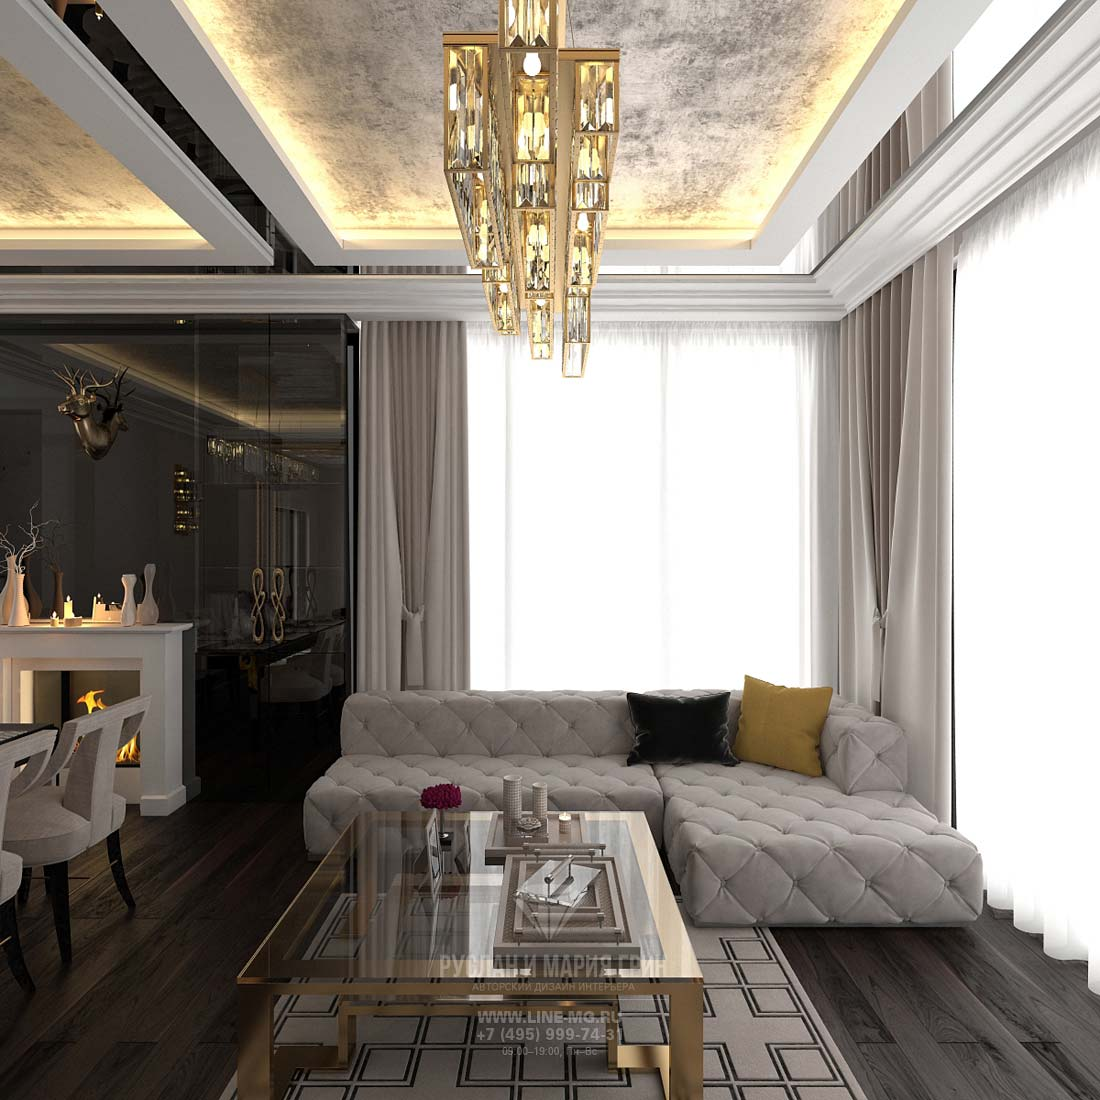 Living room desing in a modern cottage